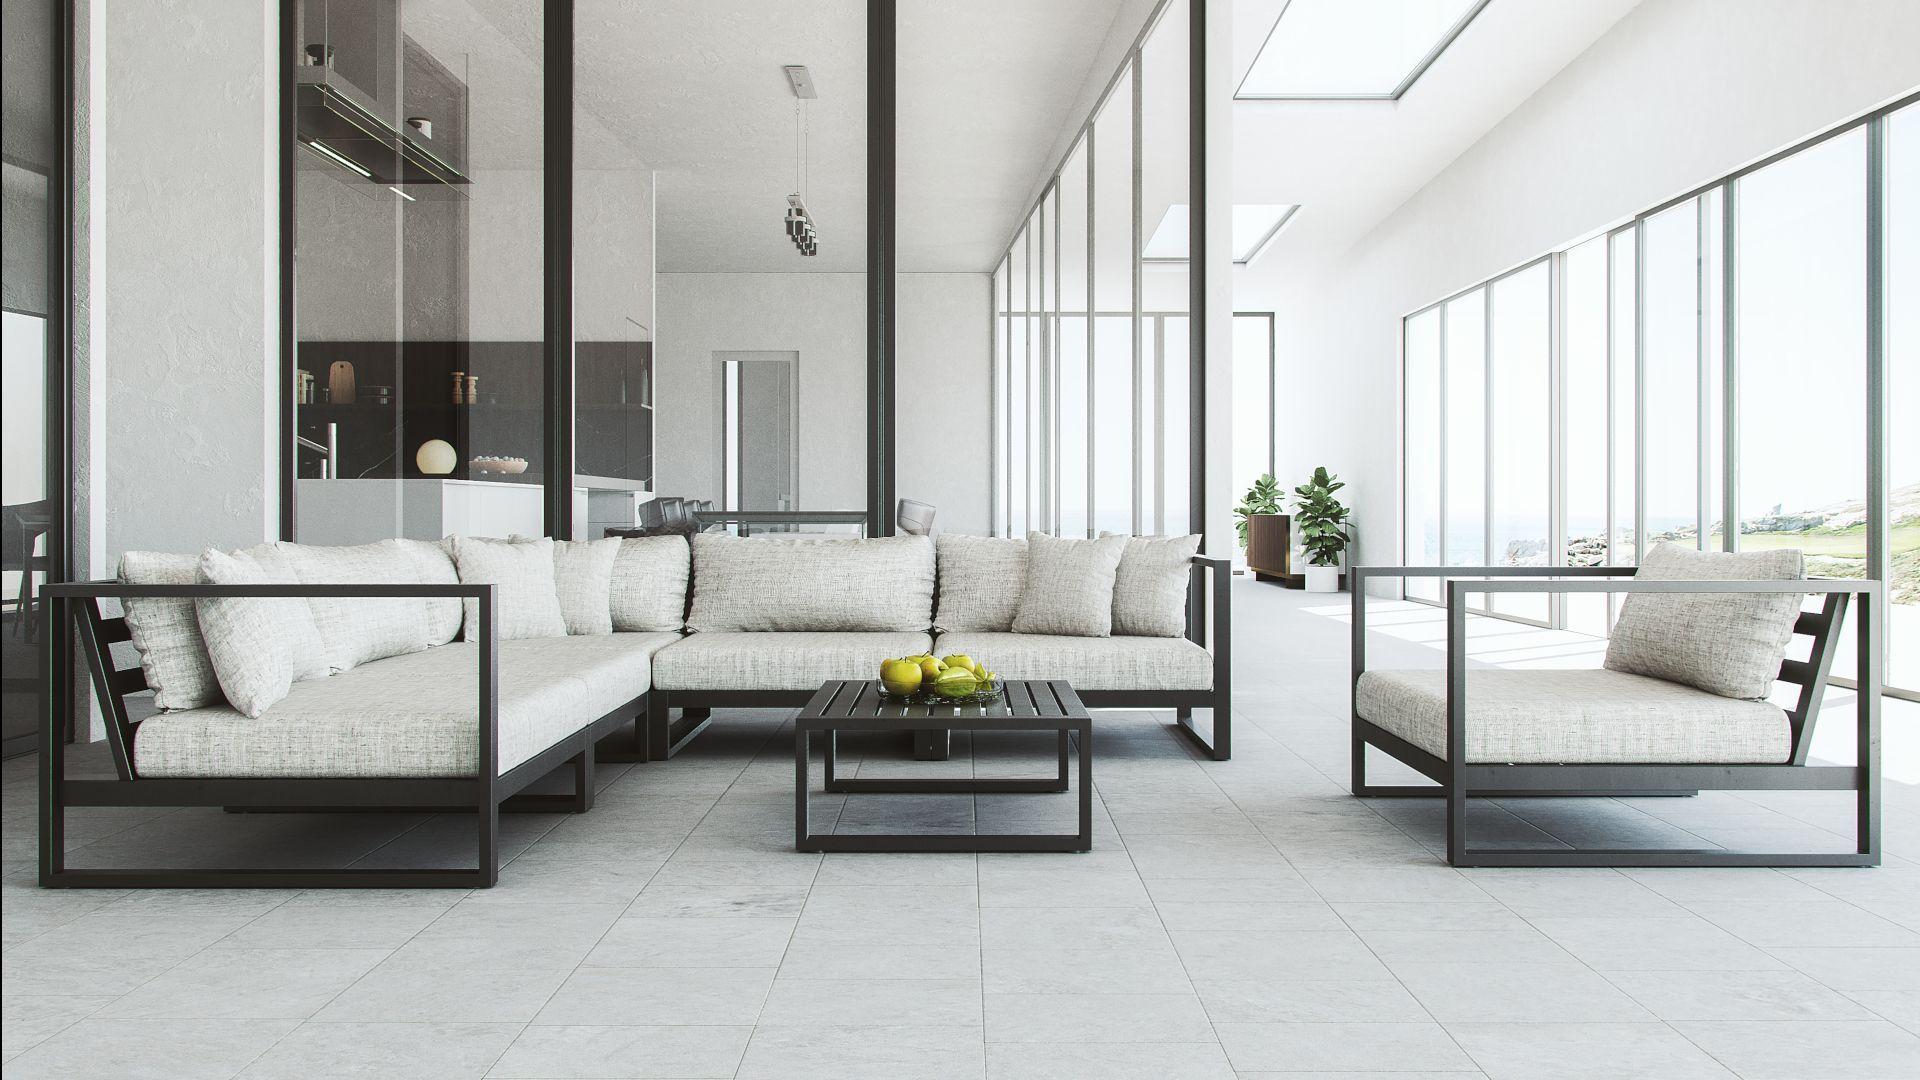 Garnitur Im Lounge Stil Artelia Gartenmobel In 2020 Lounge Mobel